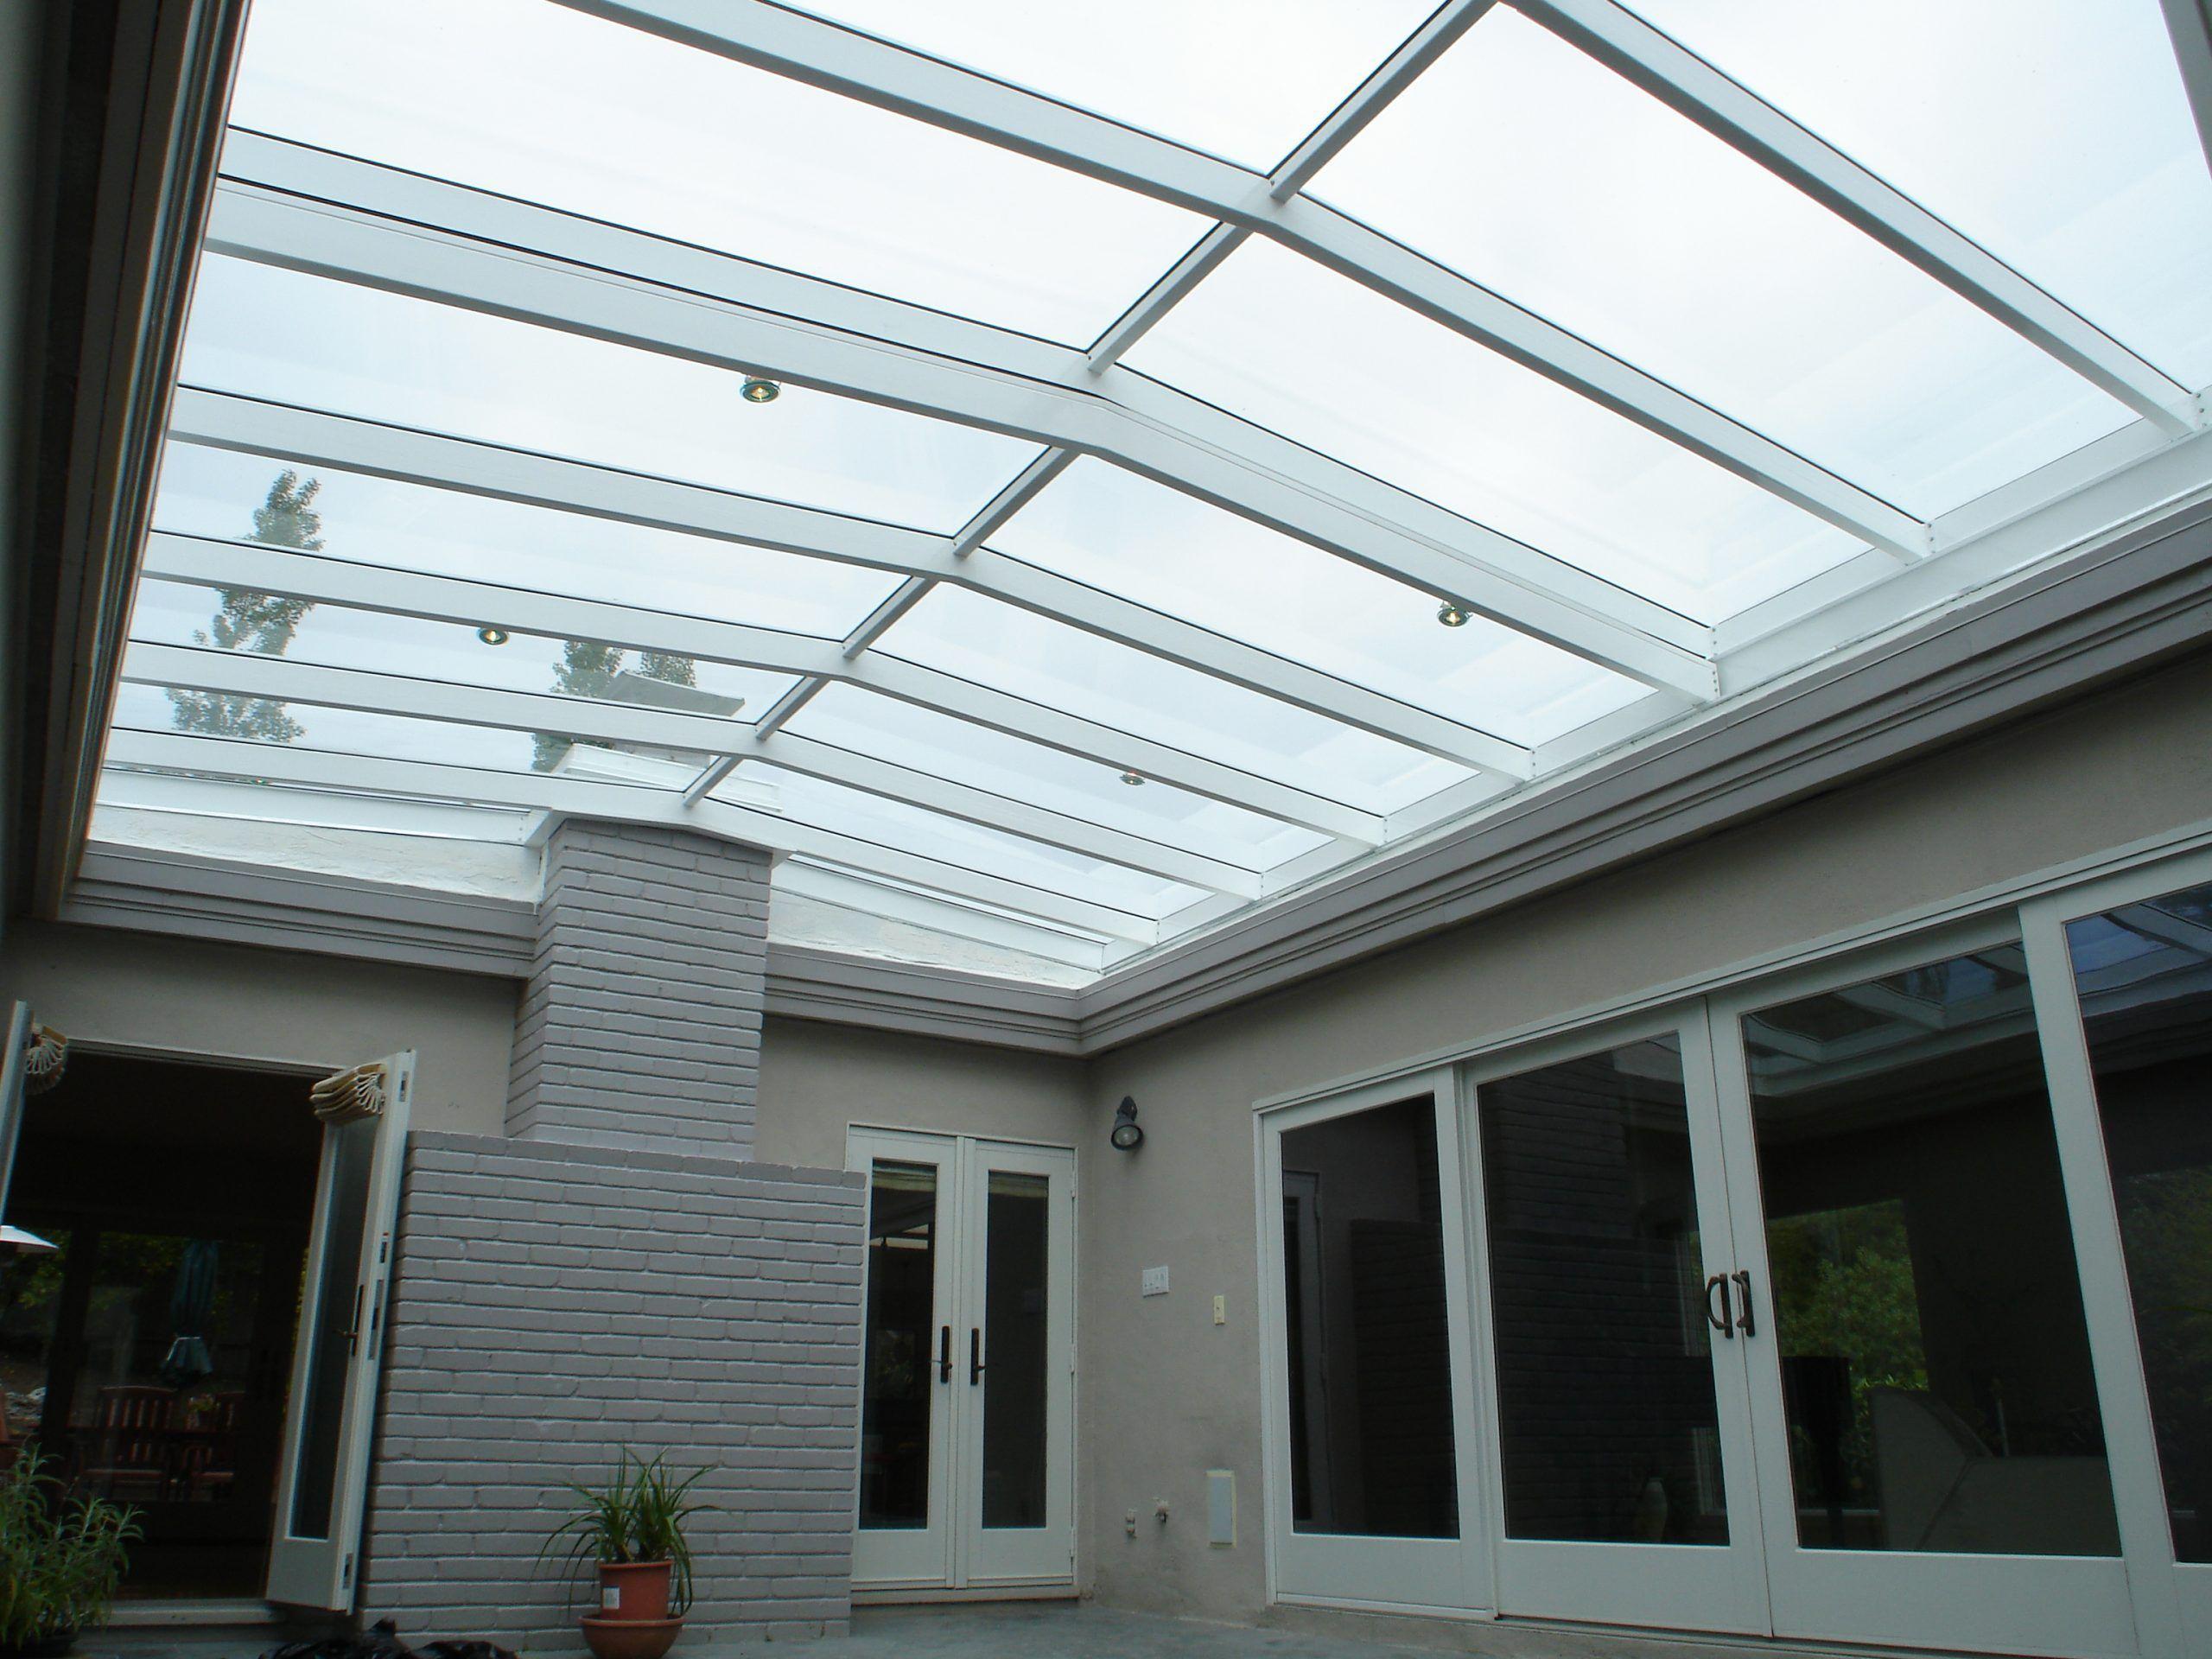 Glass atrium roof closed